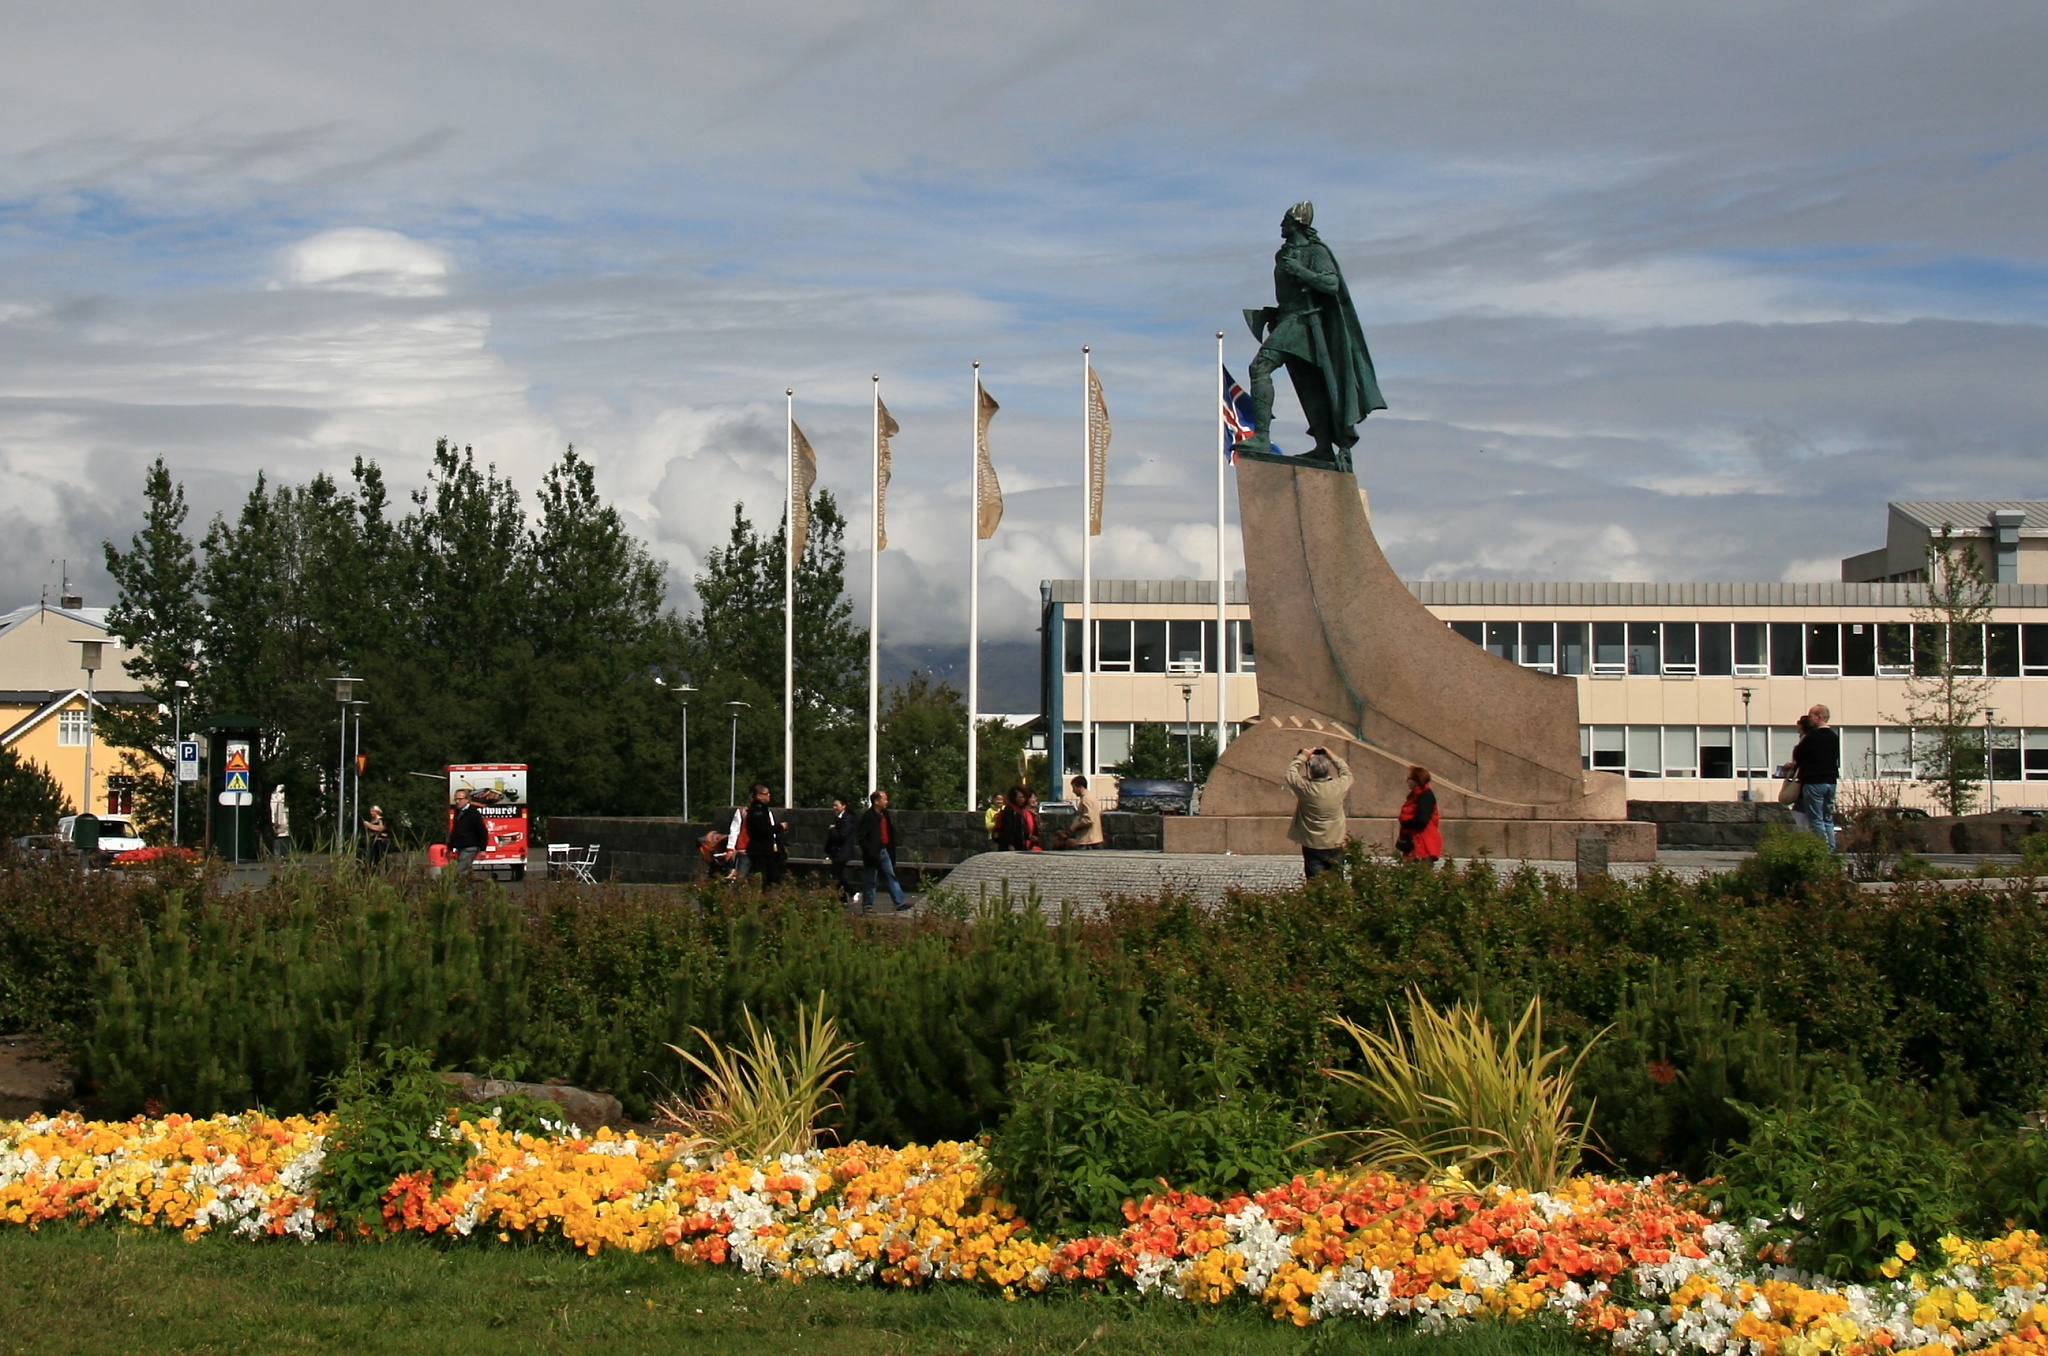 Socha Leifa Erikssona před katedrálou.